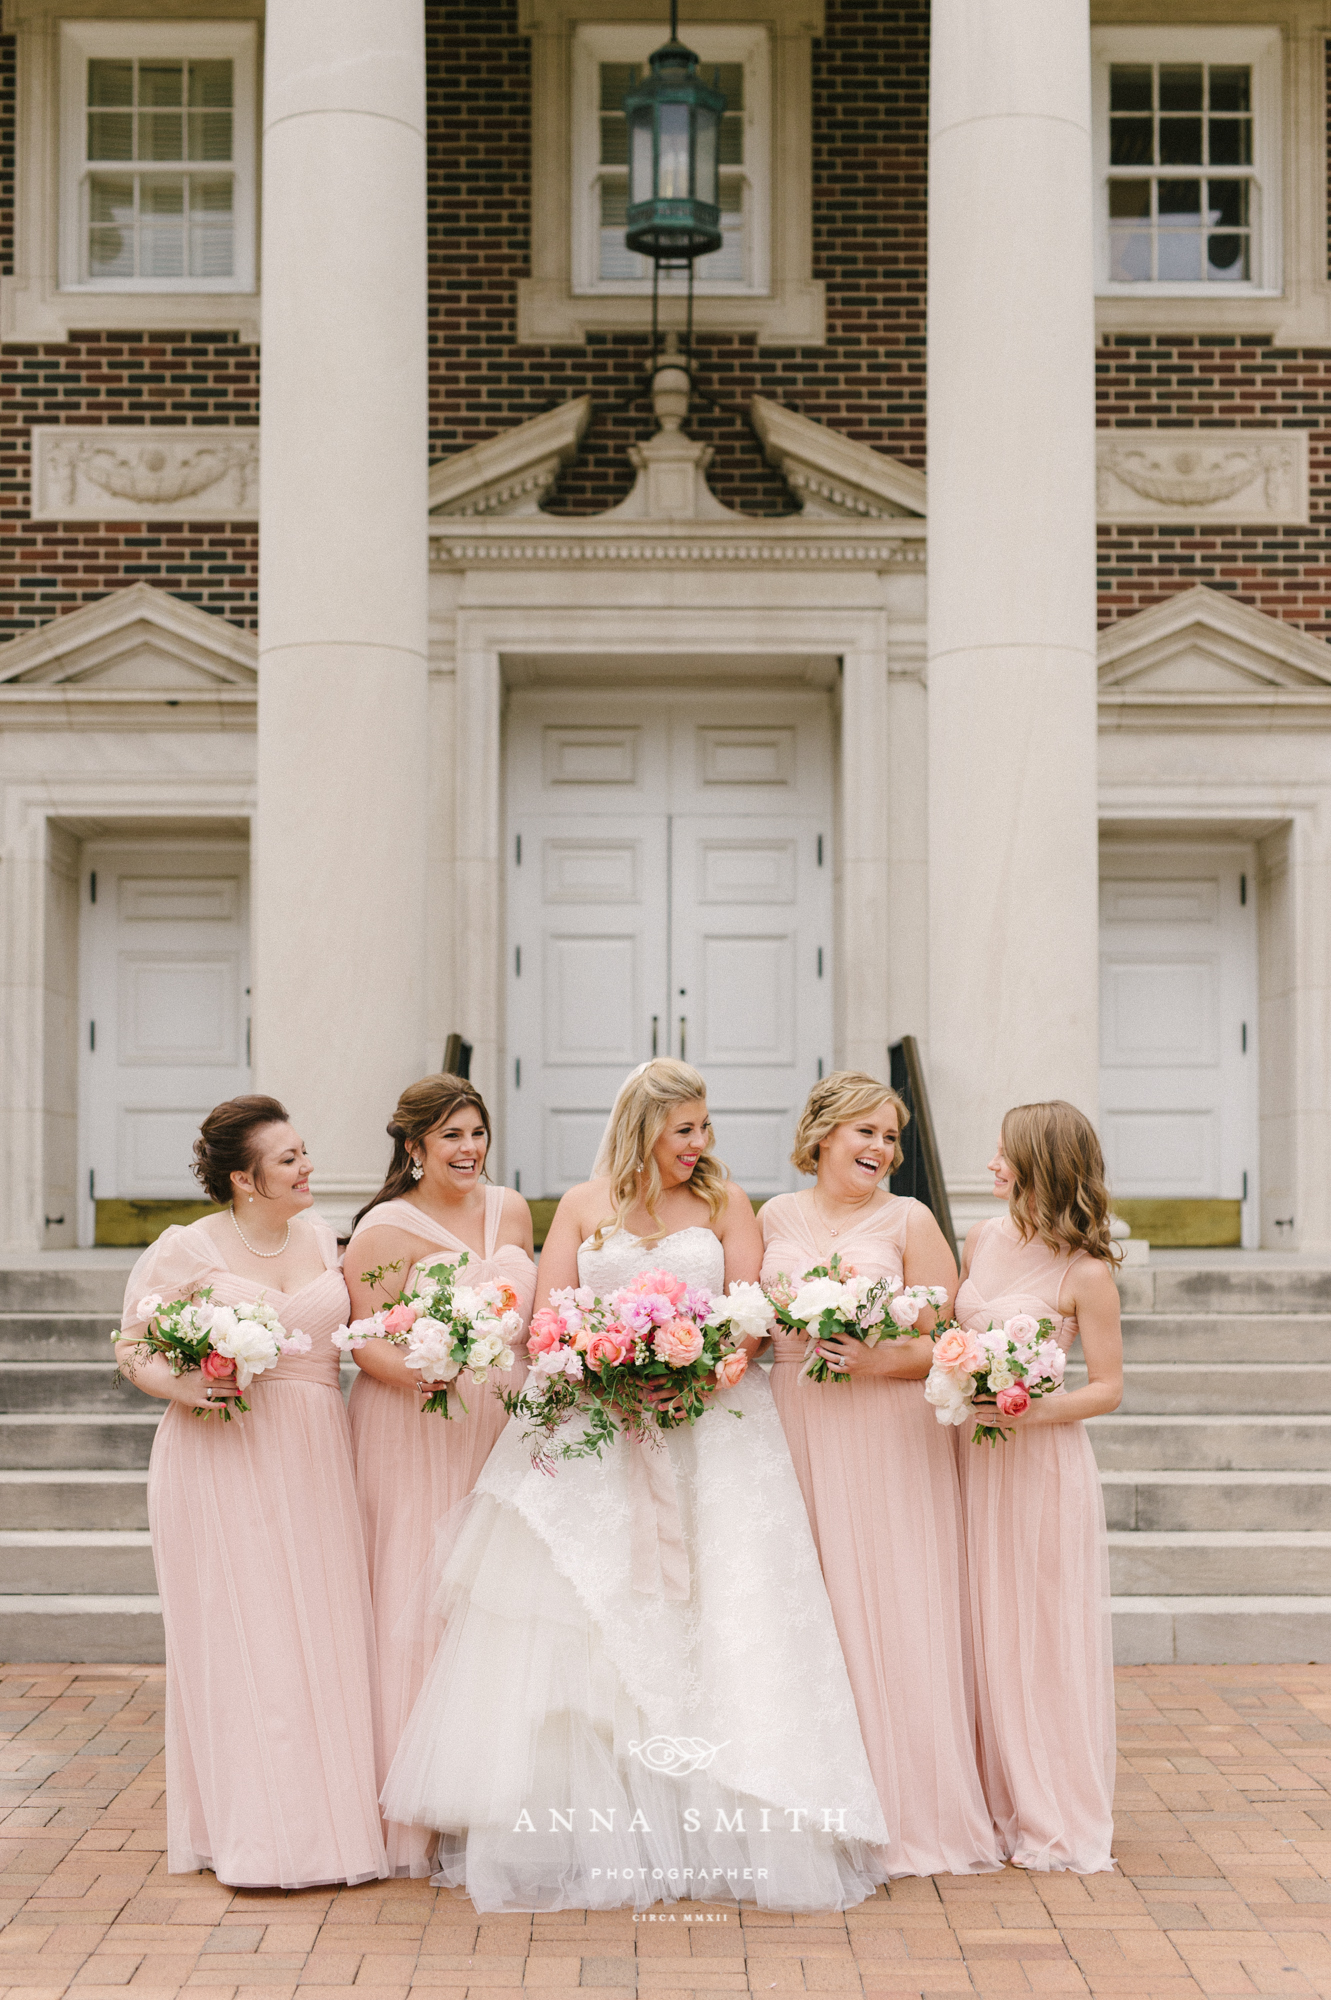 web 17- 4-W-CD-heather brandon wedding perkins adolphus-255.jpg